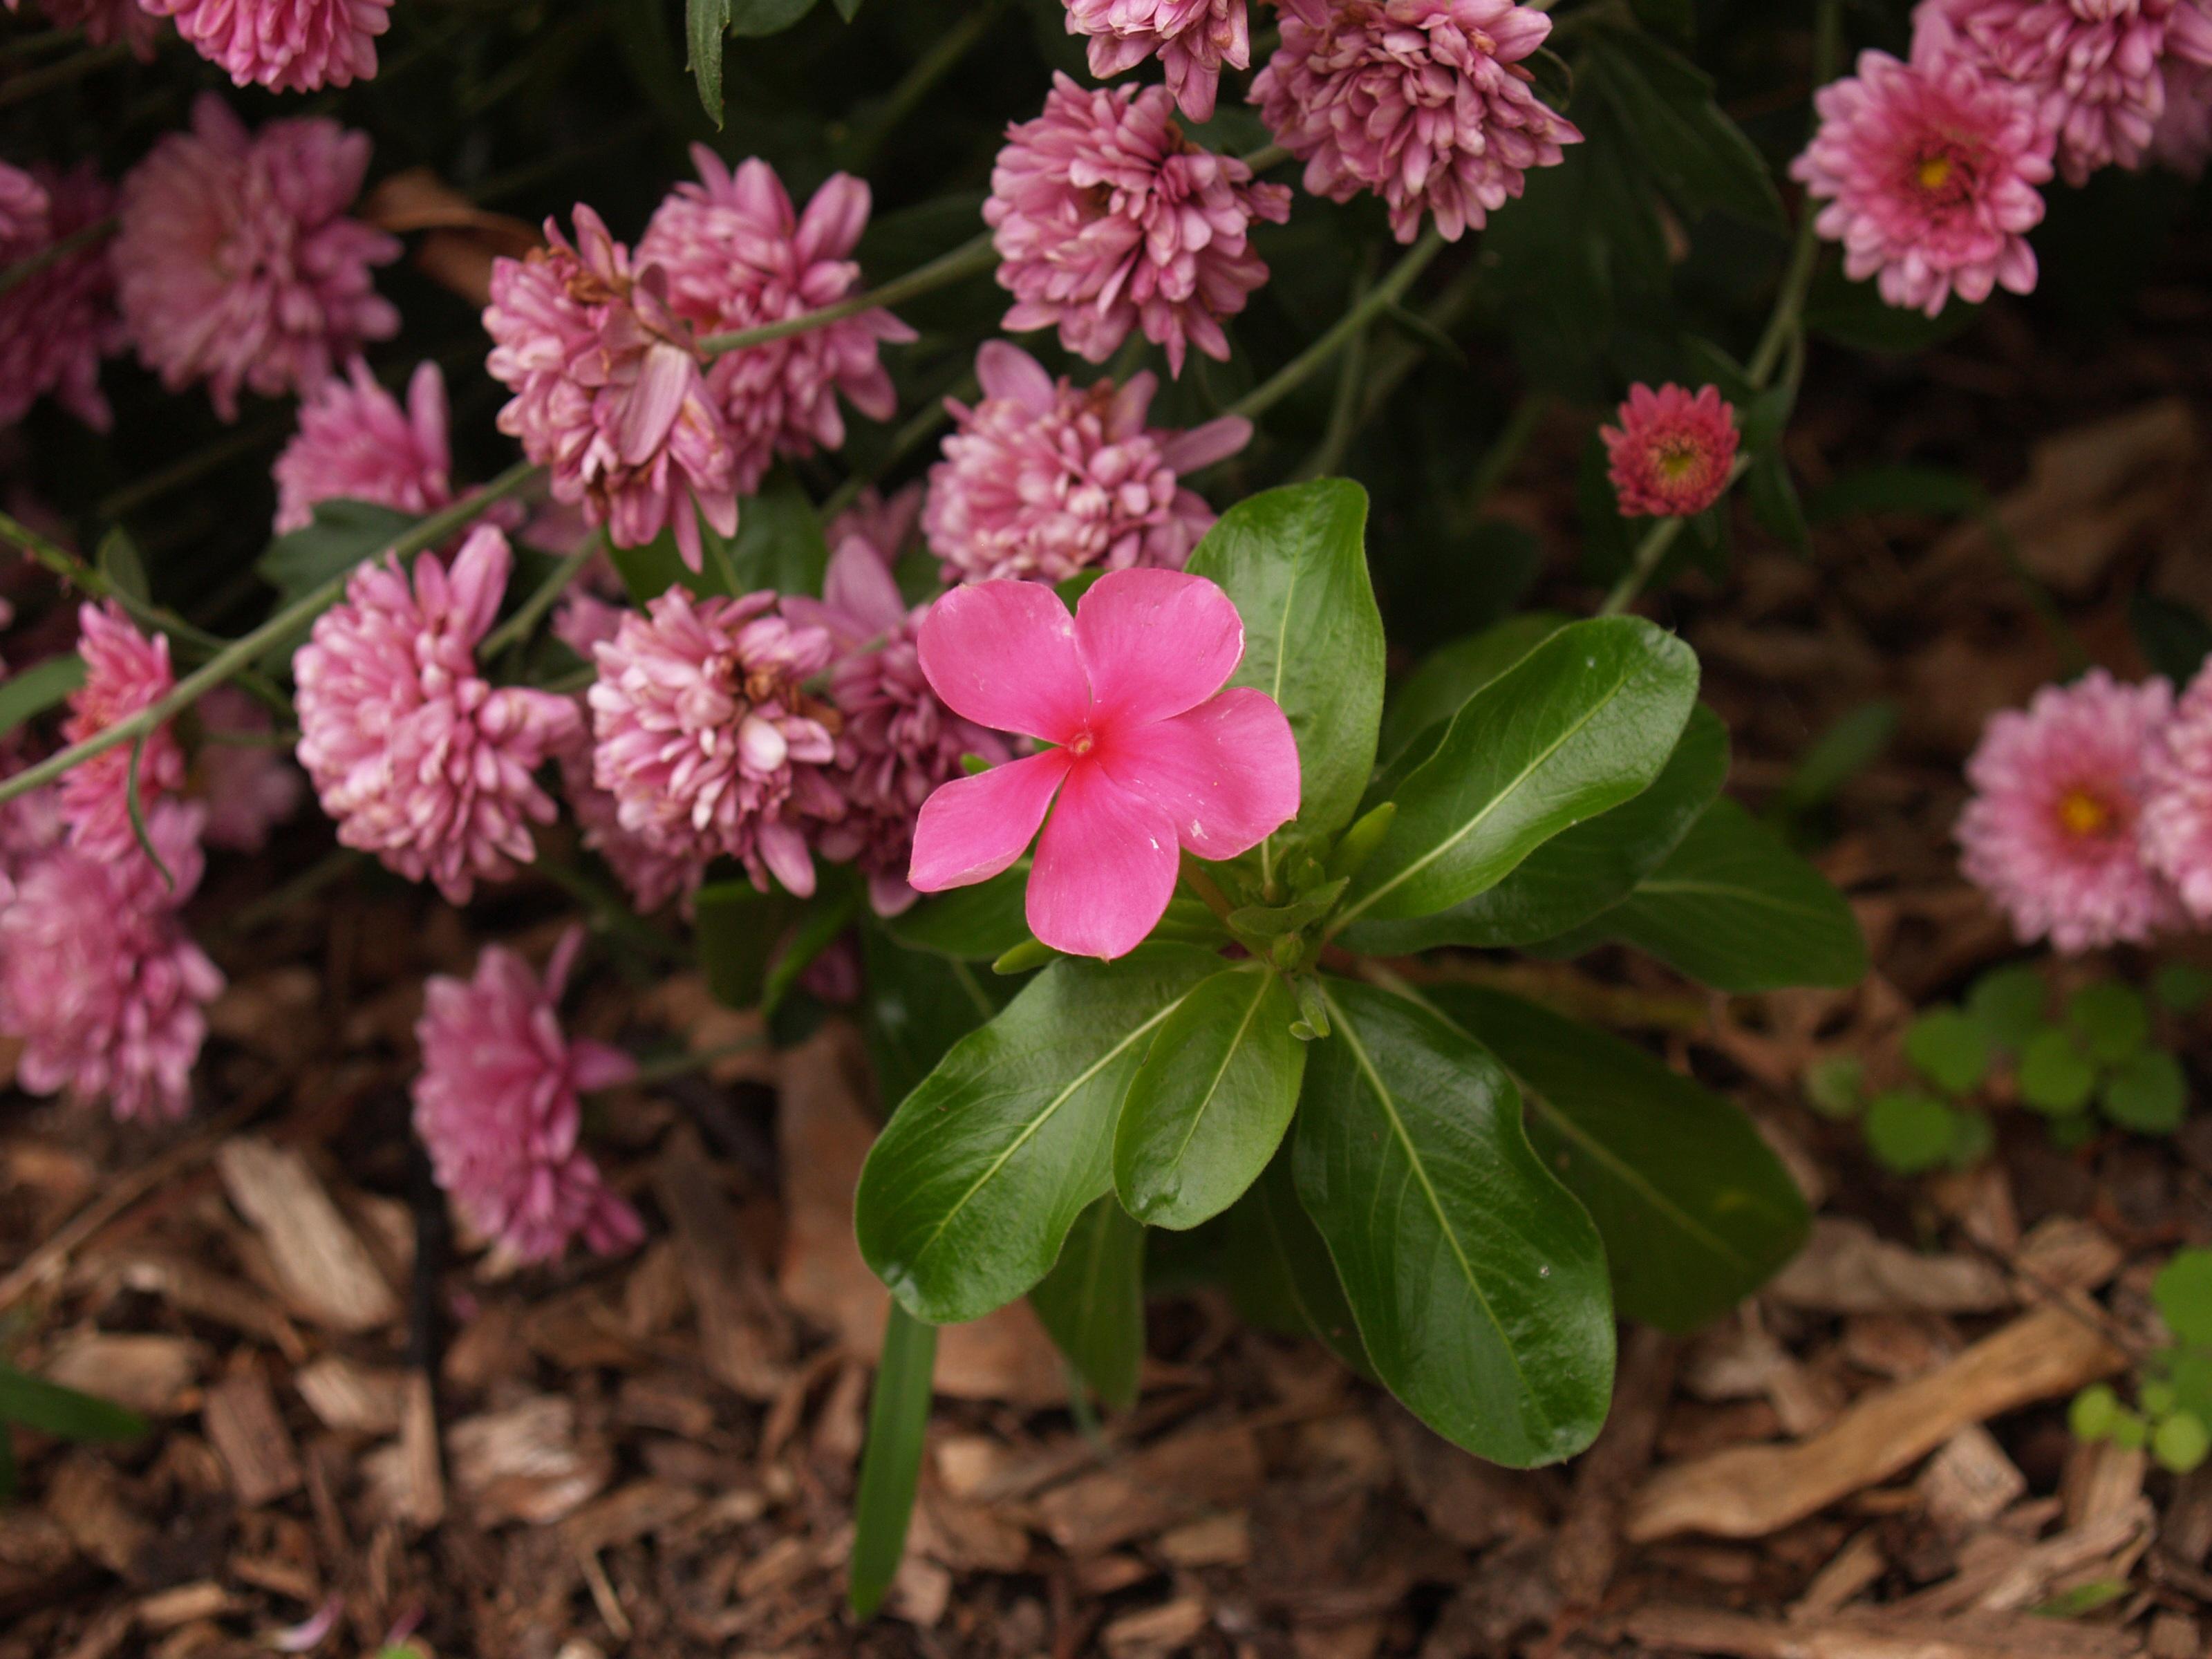 Free Images : nature, blossom, herb, botany, pink, flora